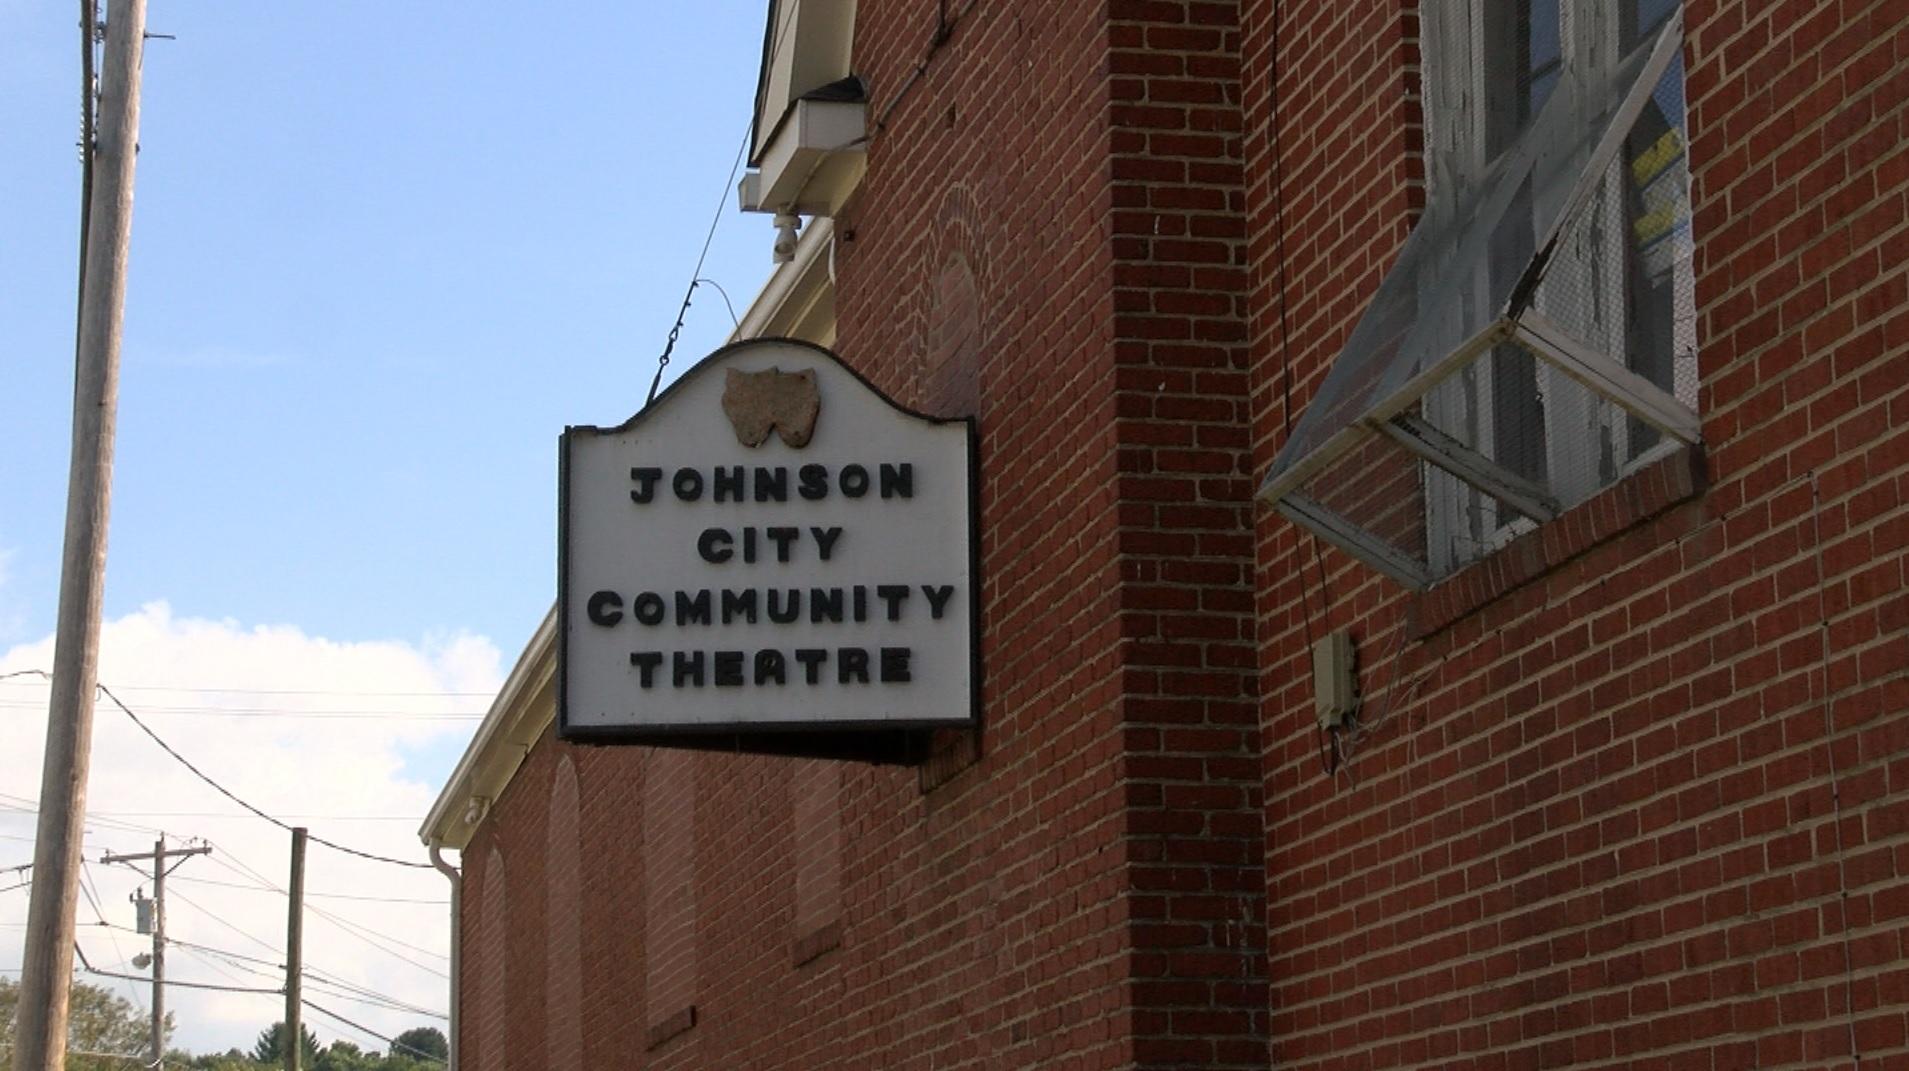 jc theatre_1538679153179.jpg.jpg